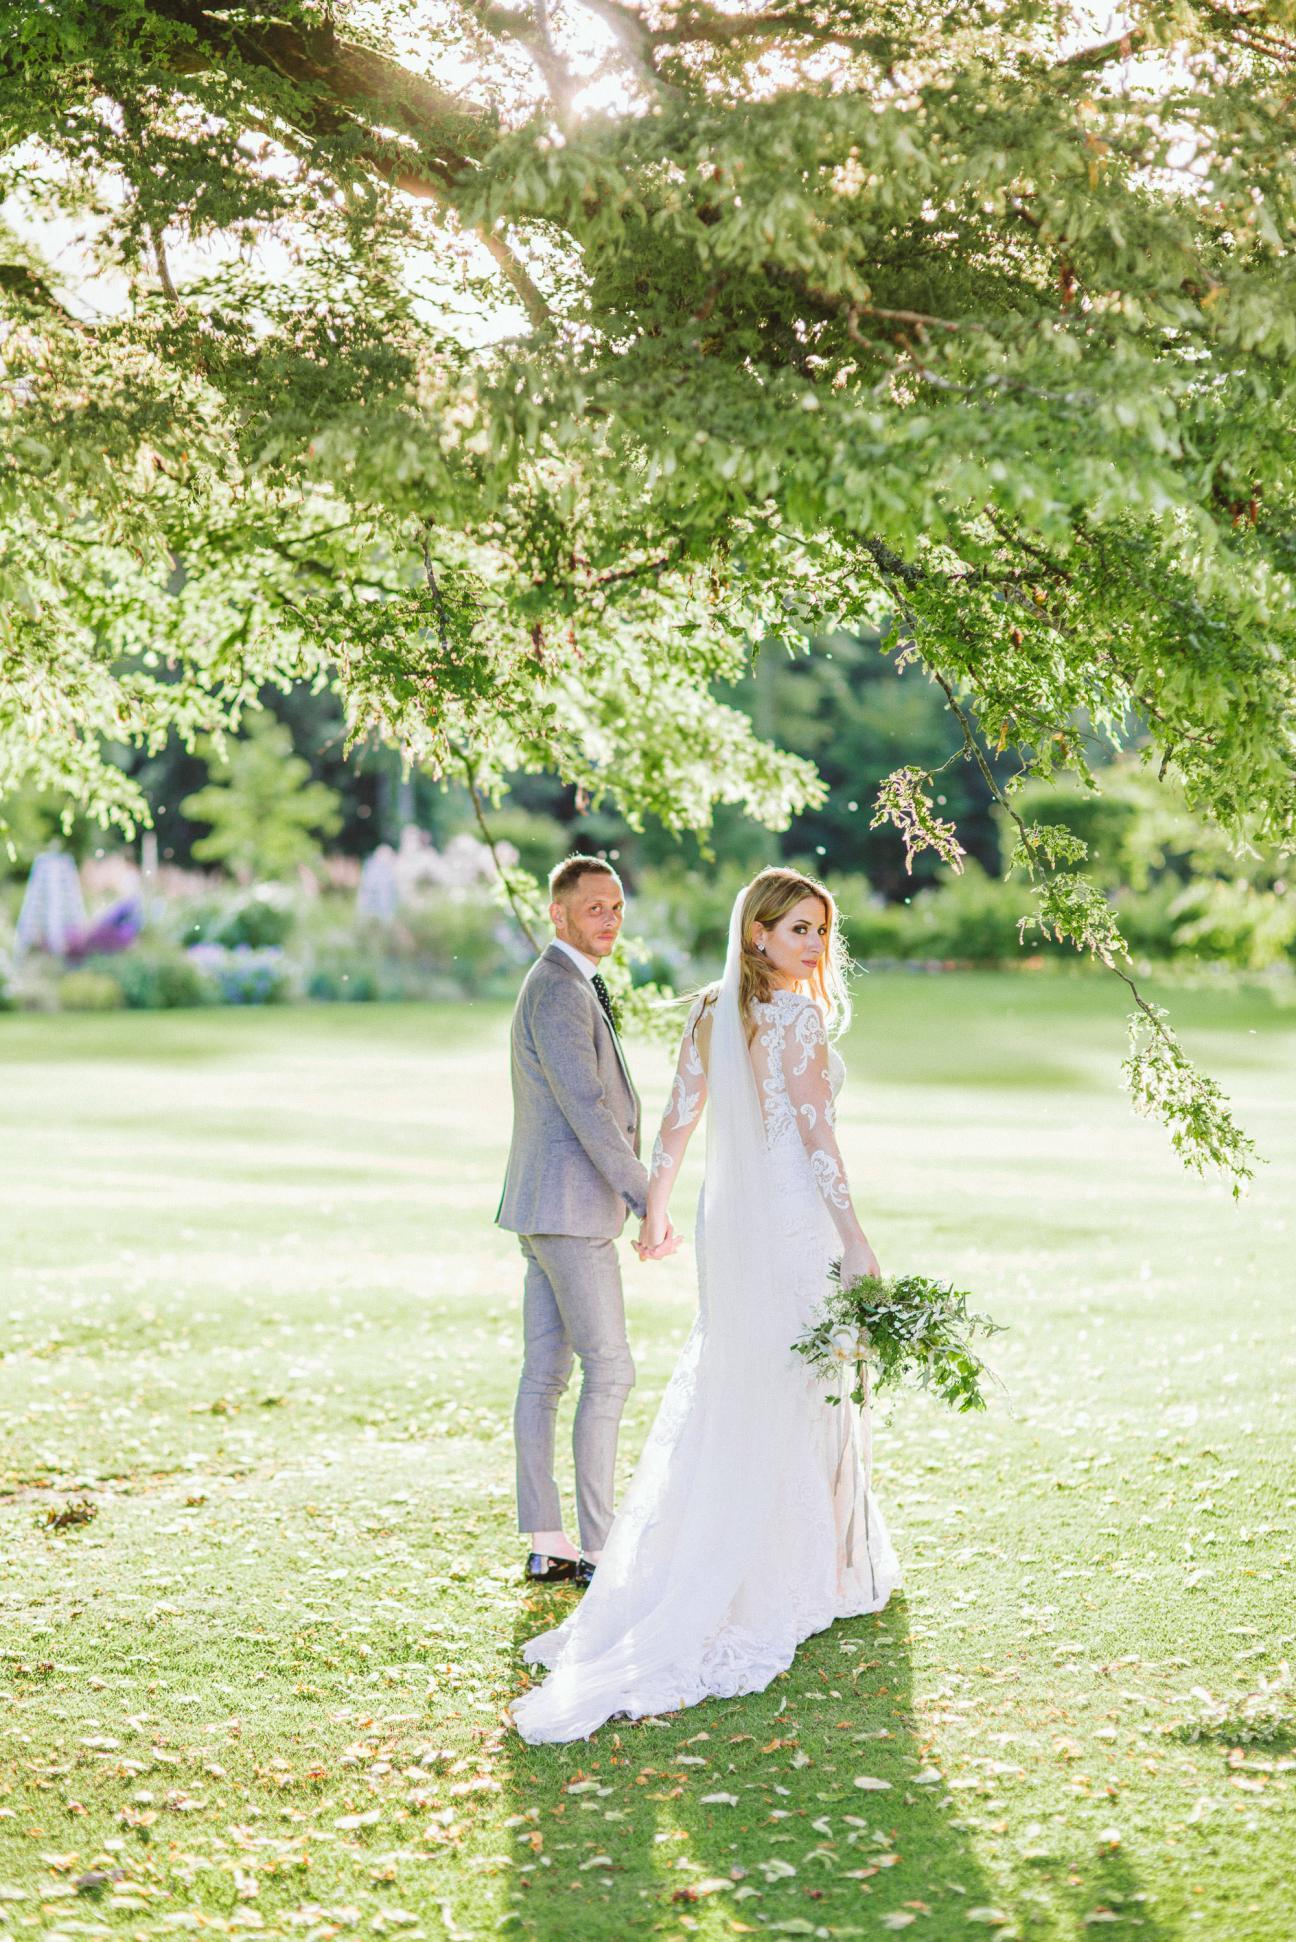 Wedding at Fasque Castle